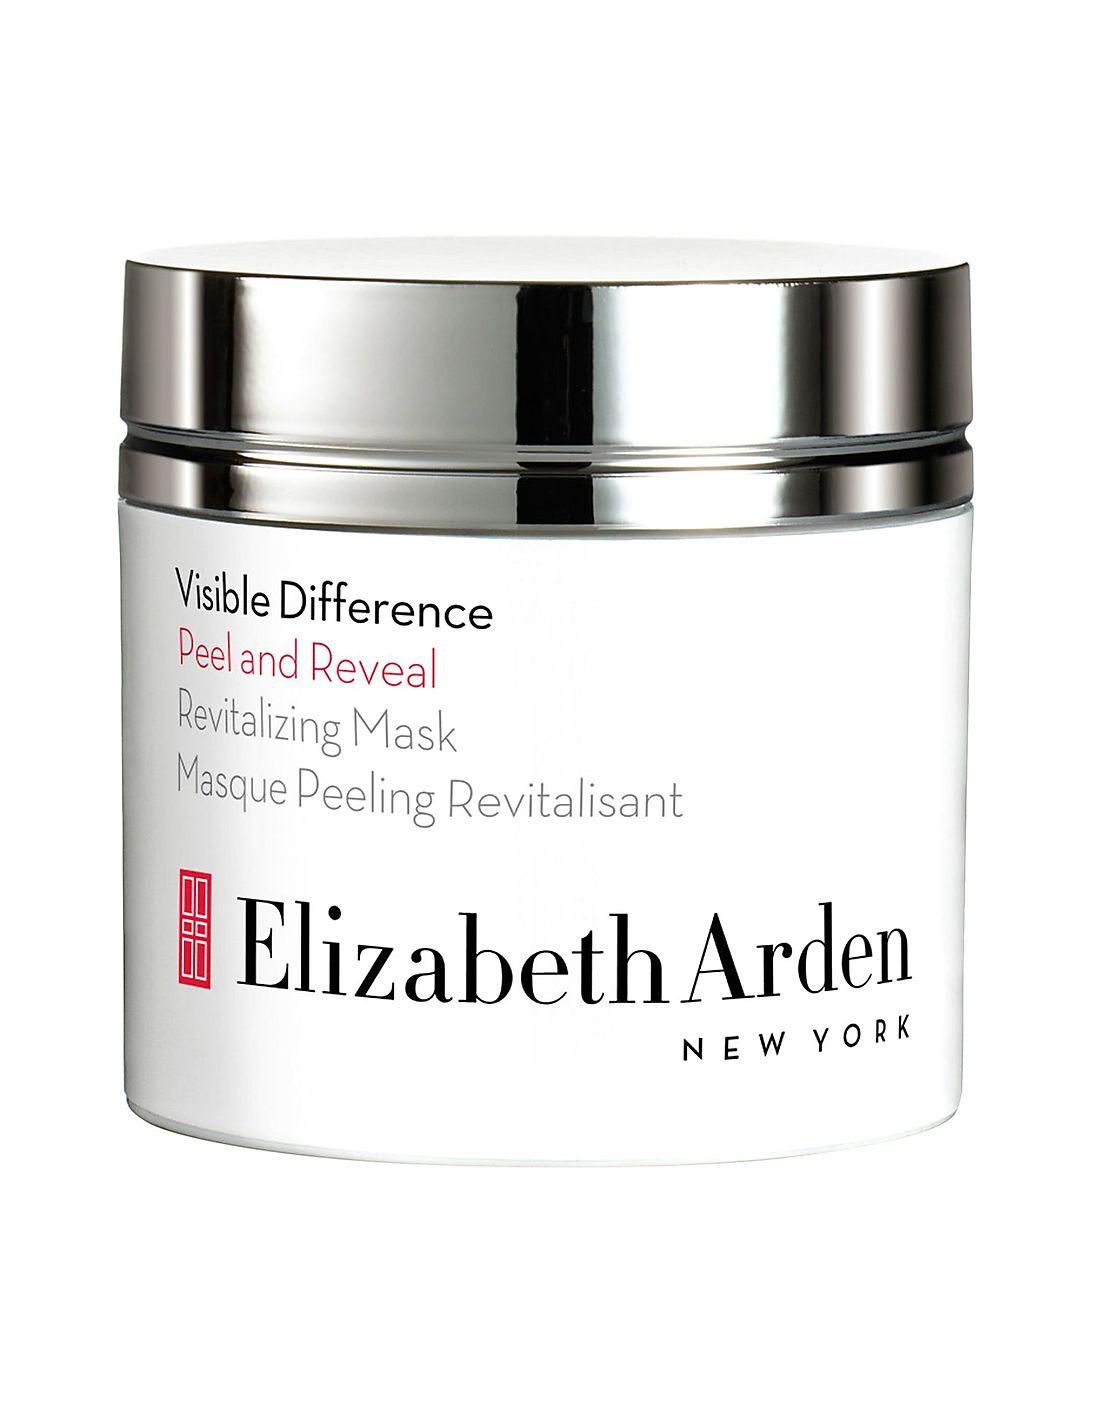 bridal beauty products, bridal trousseau, Elizabeth Arden